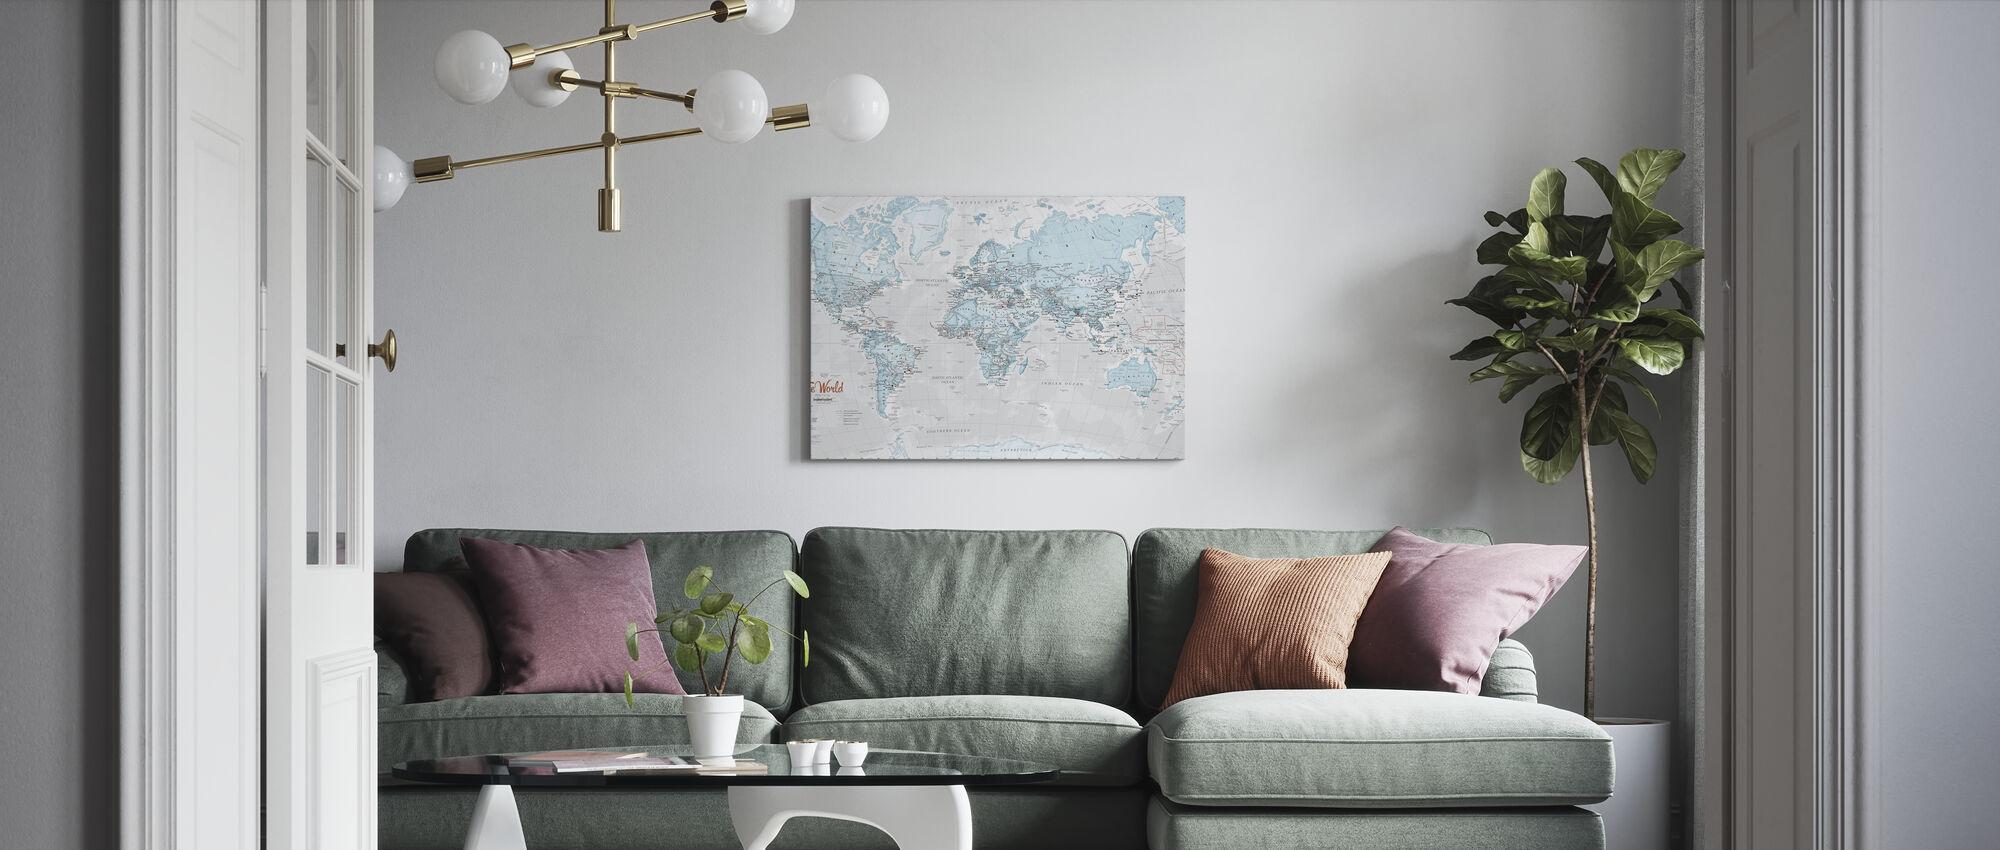 Weltkarte Politisches Aqua - Leinwandbild - Wohnzimmer